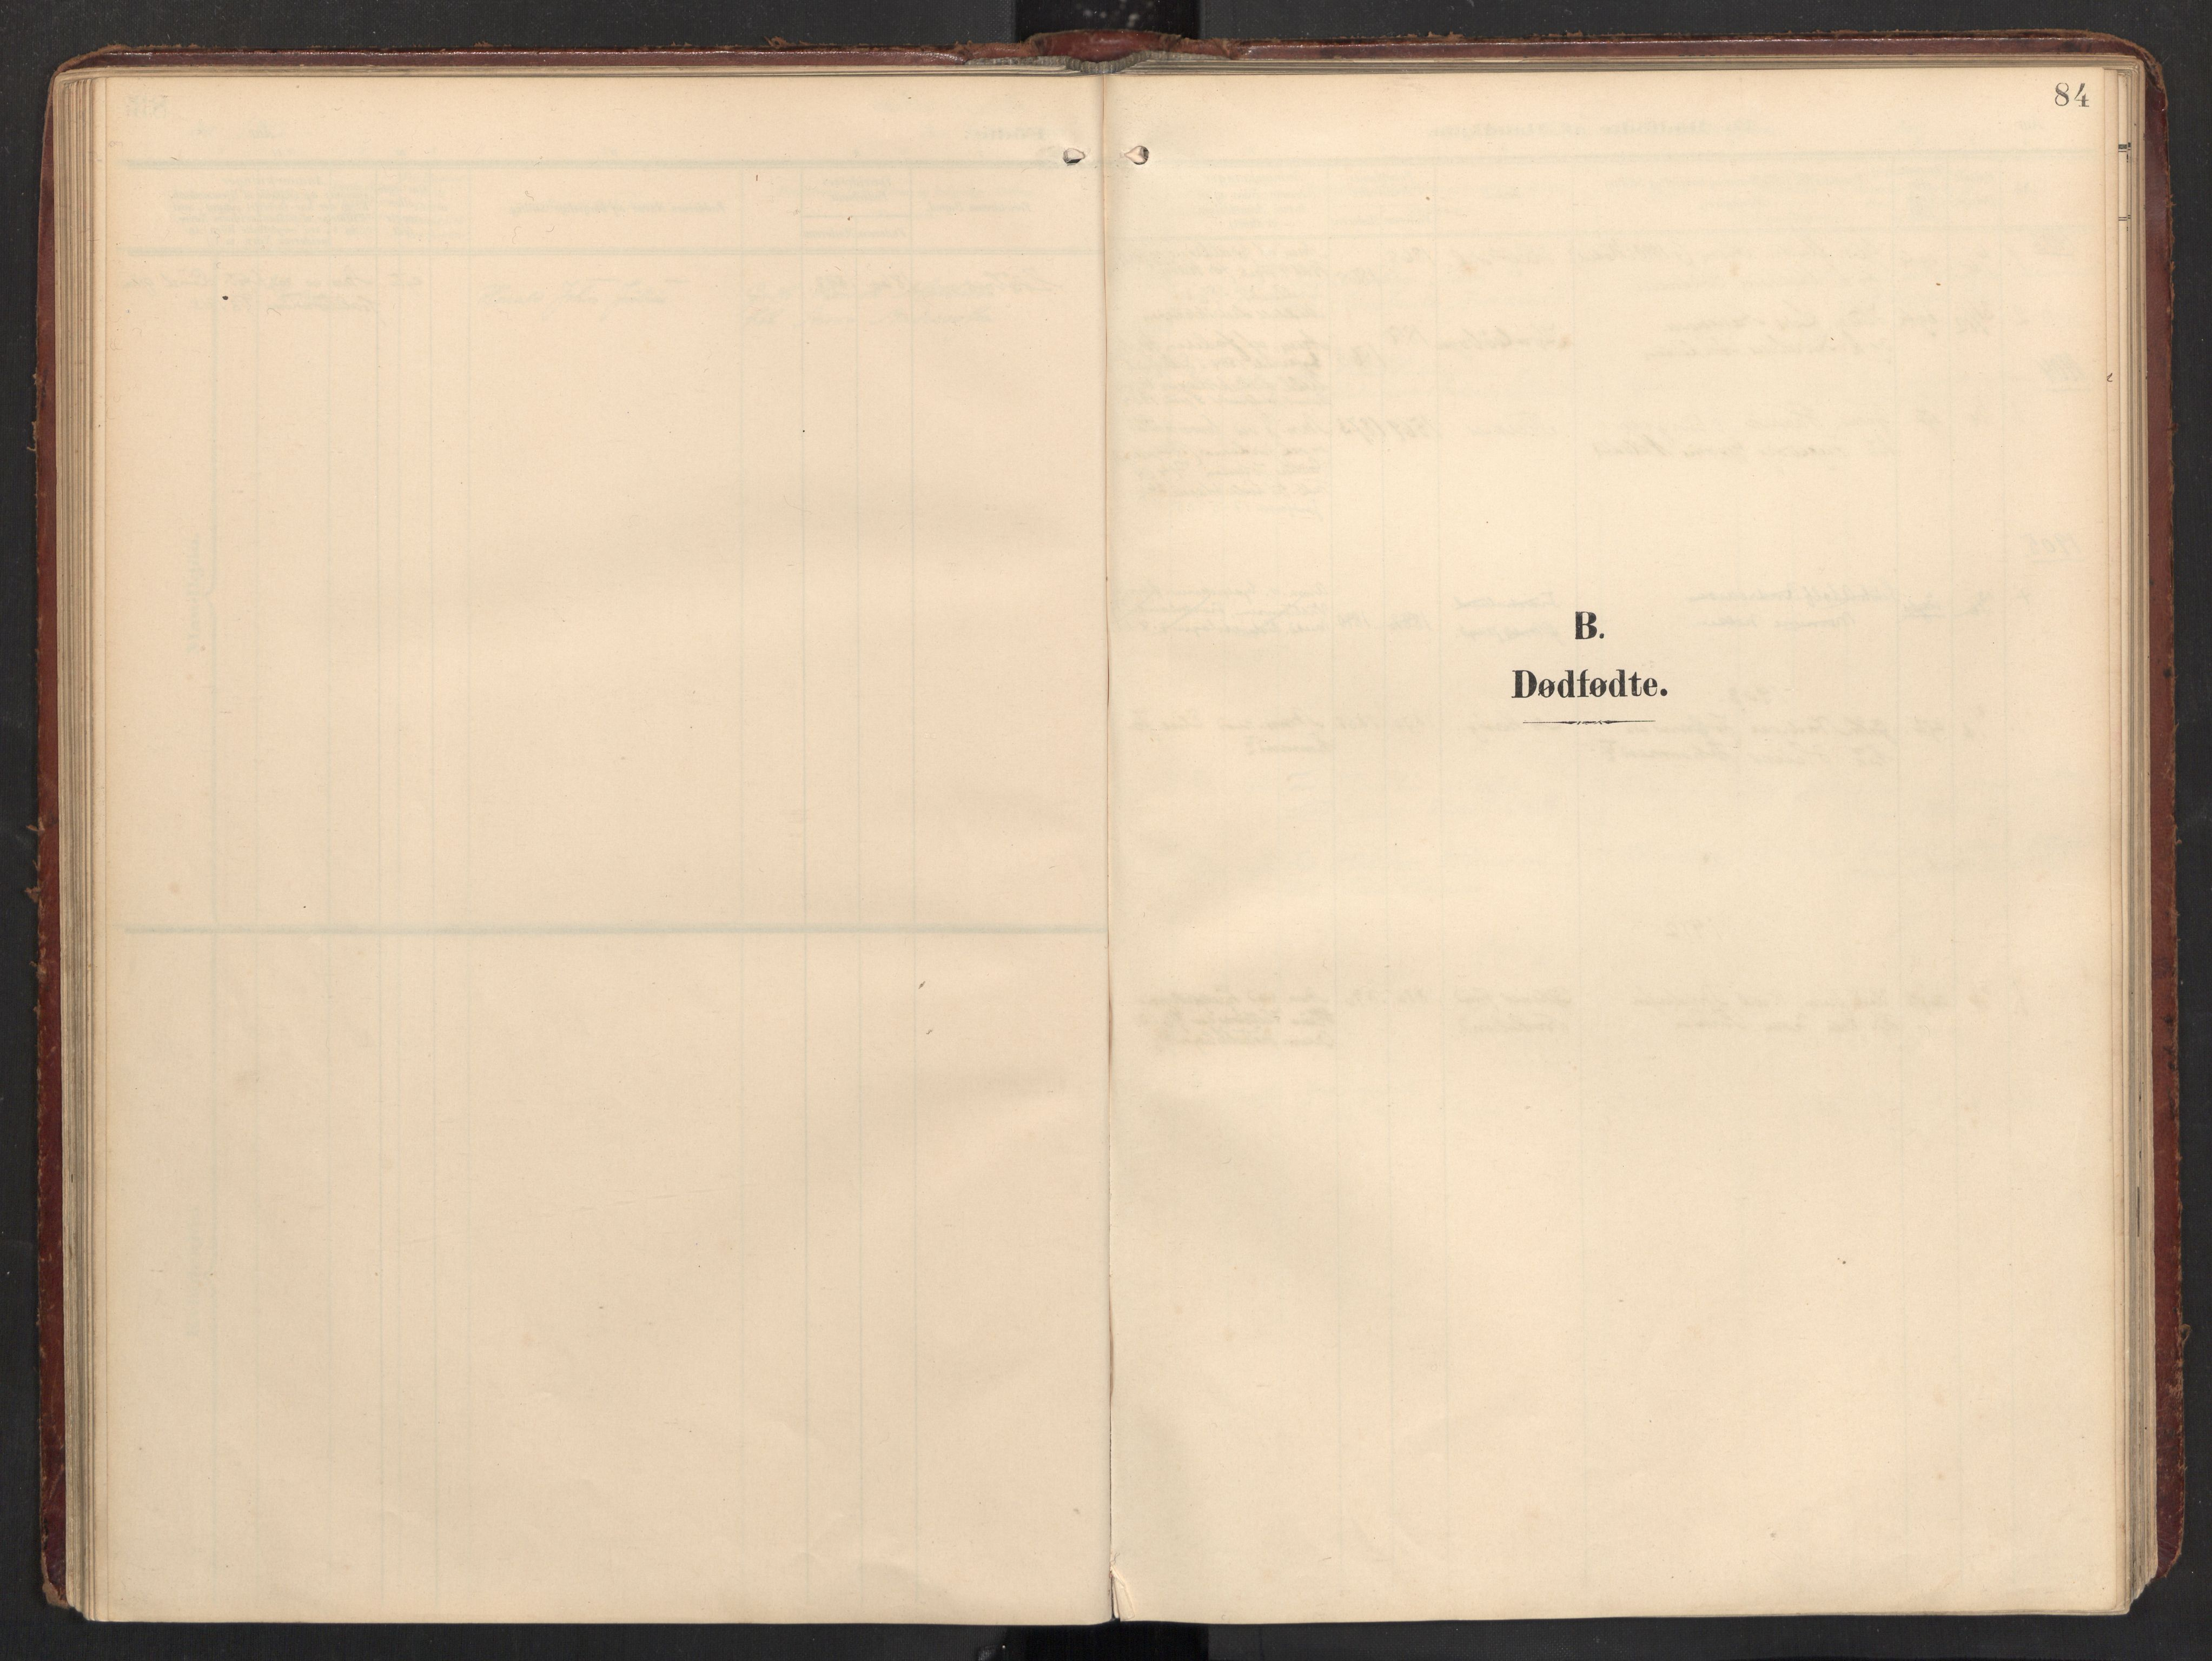 SAT, Ministerialprotokoller, klokkerbøker og fødselsregistre - Nordland, 890/L1287: Ministerialbok nr. 890A02, 1903-1915, s. 84